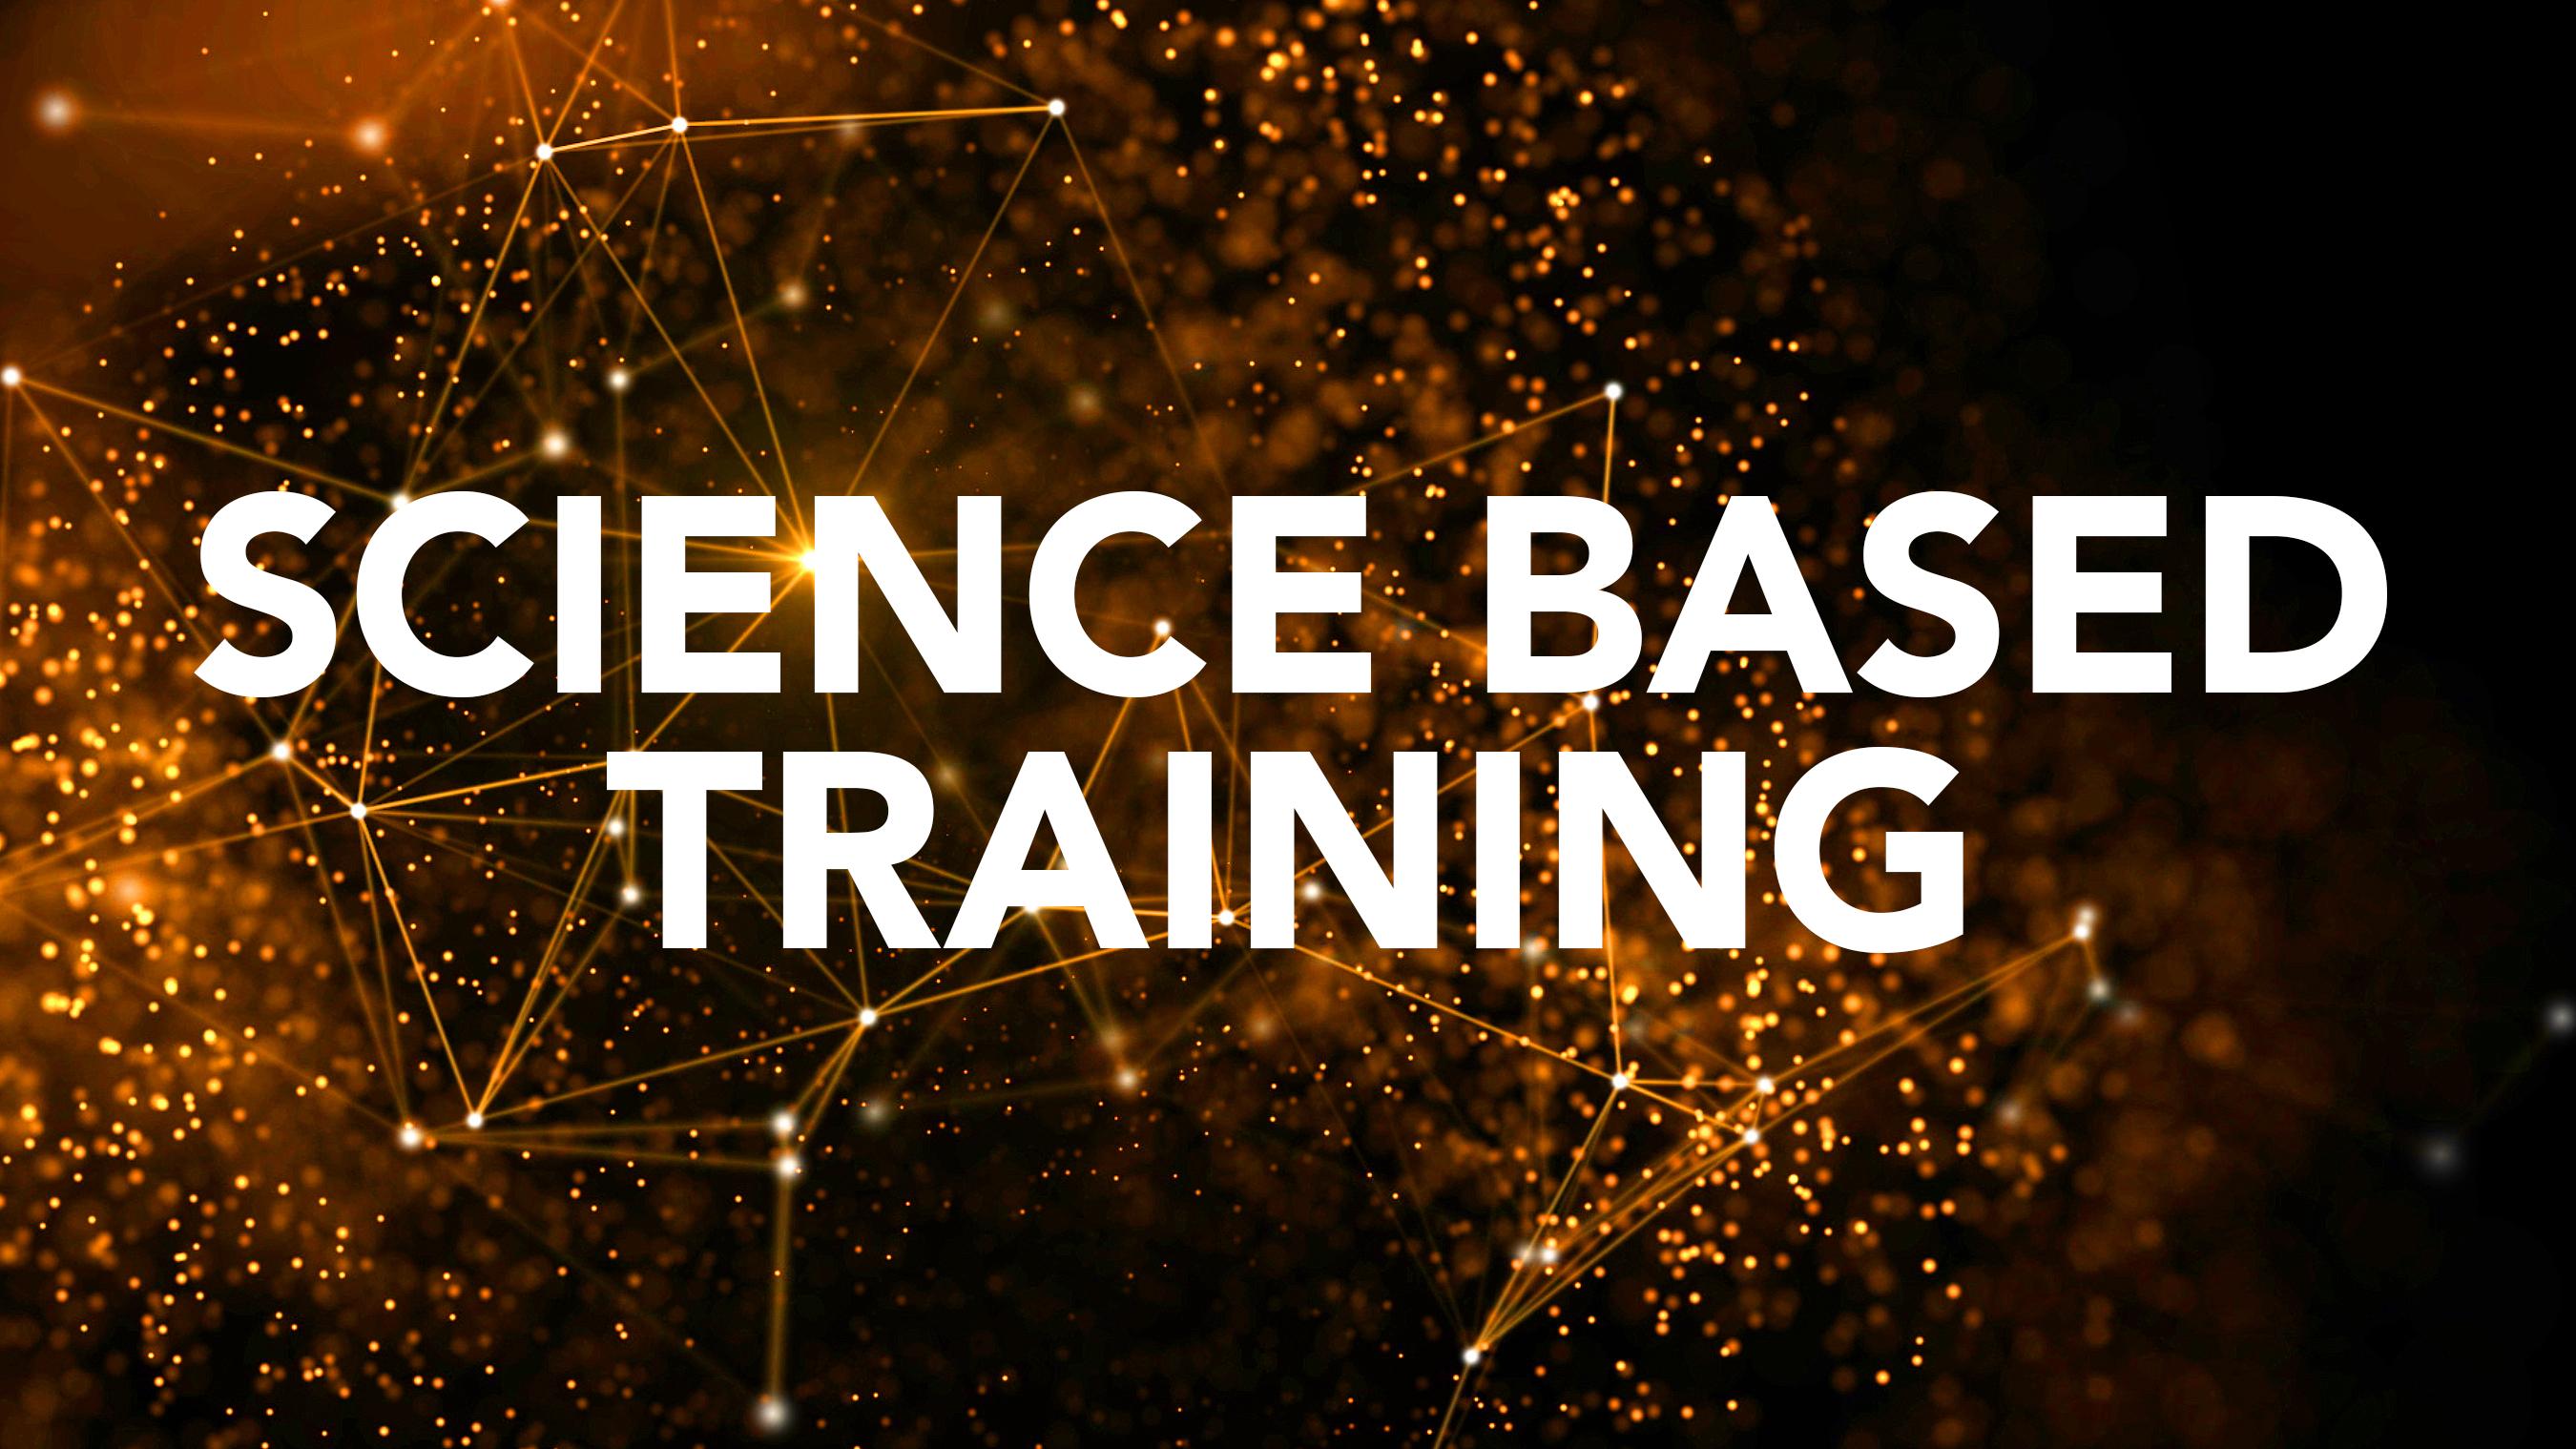 Science Based Training